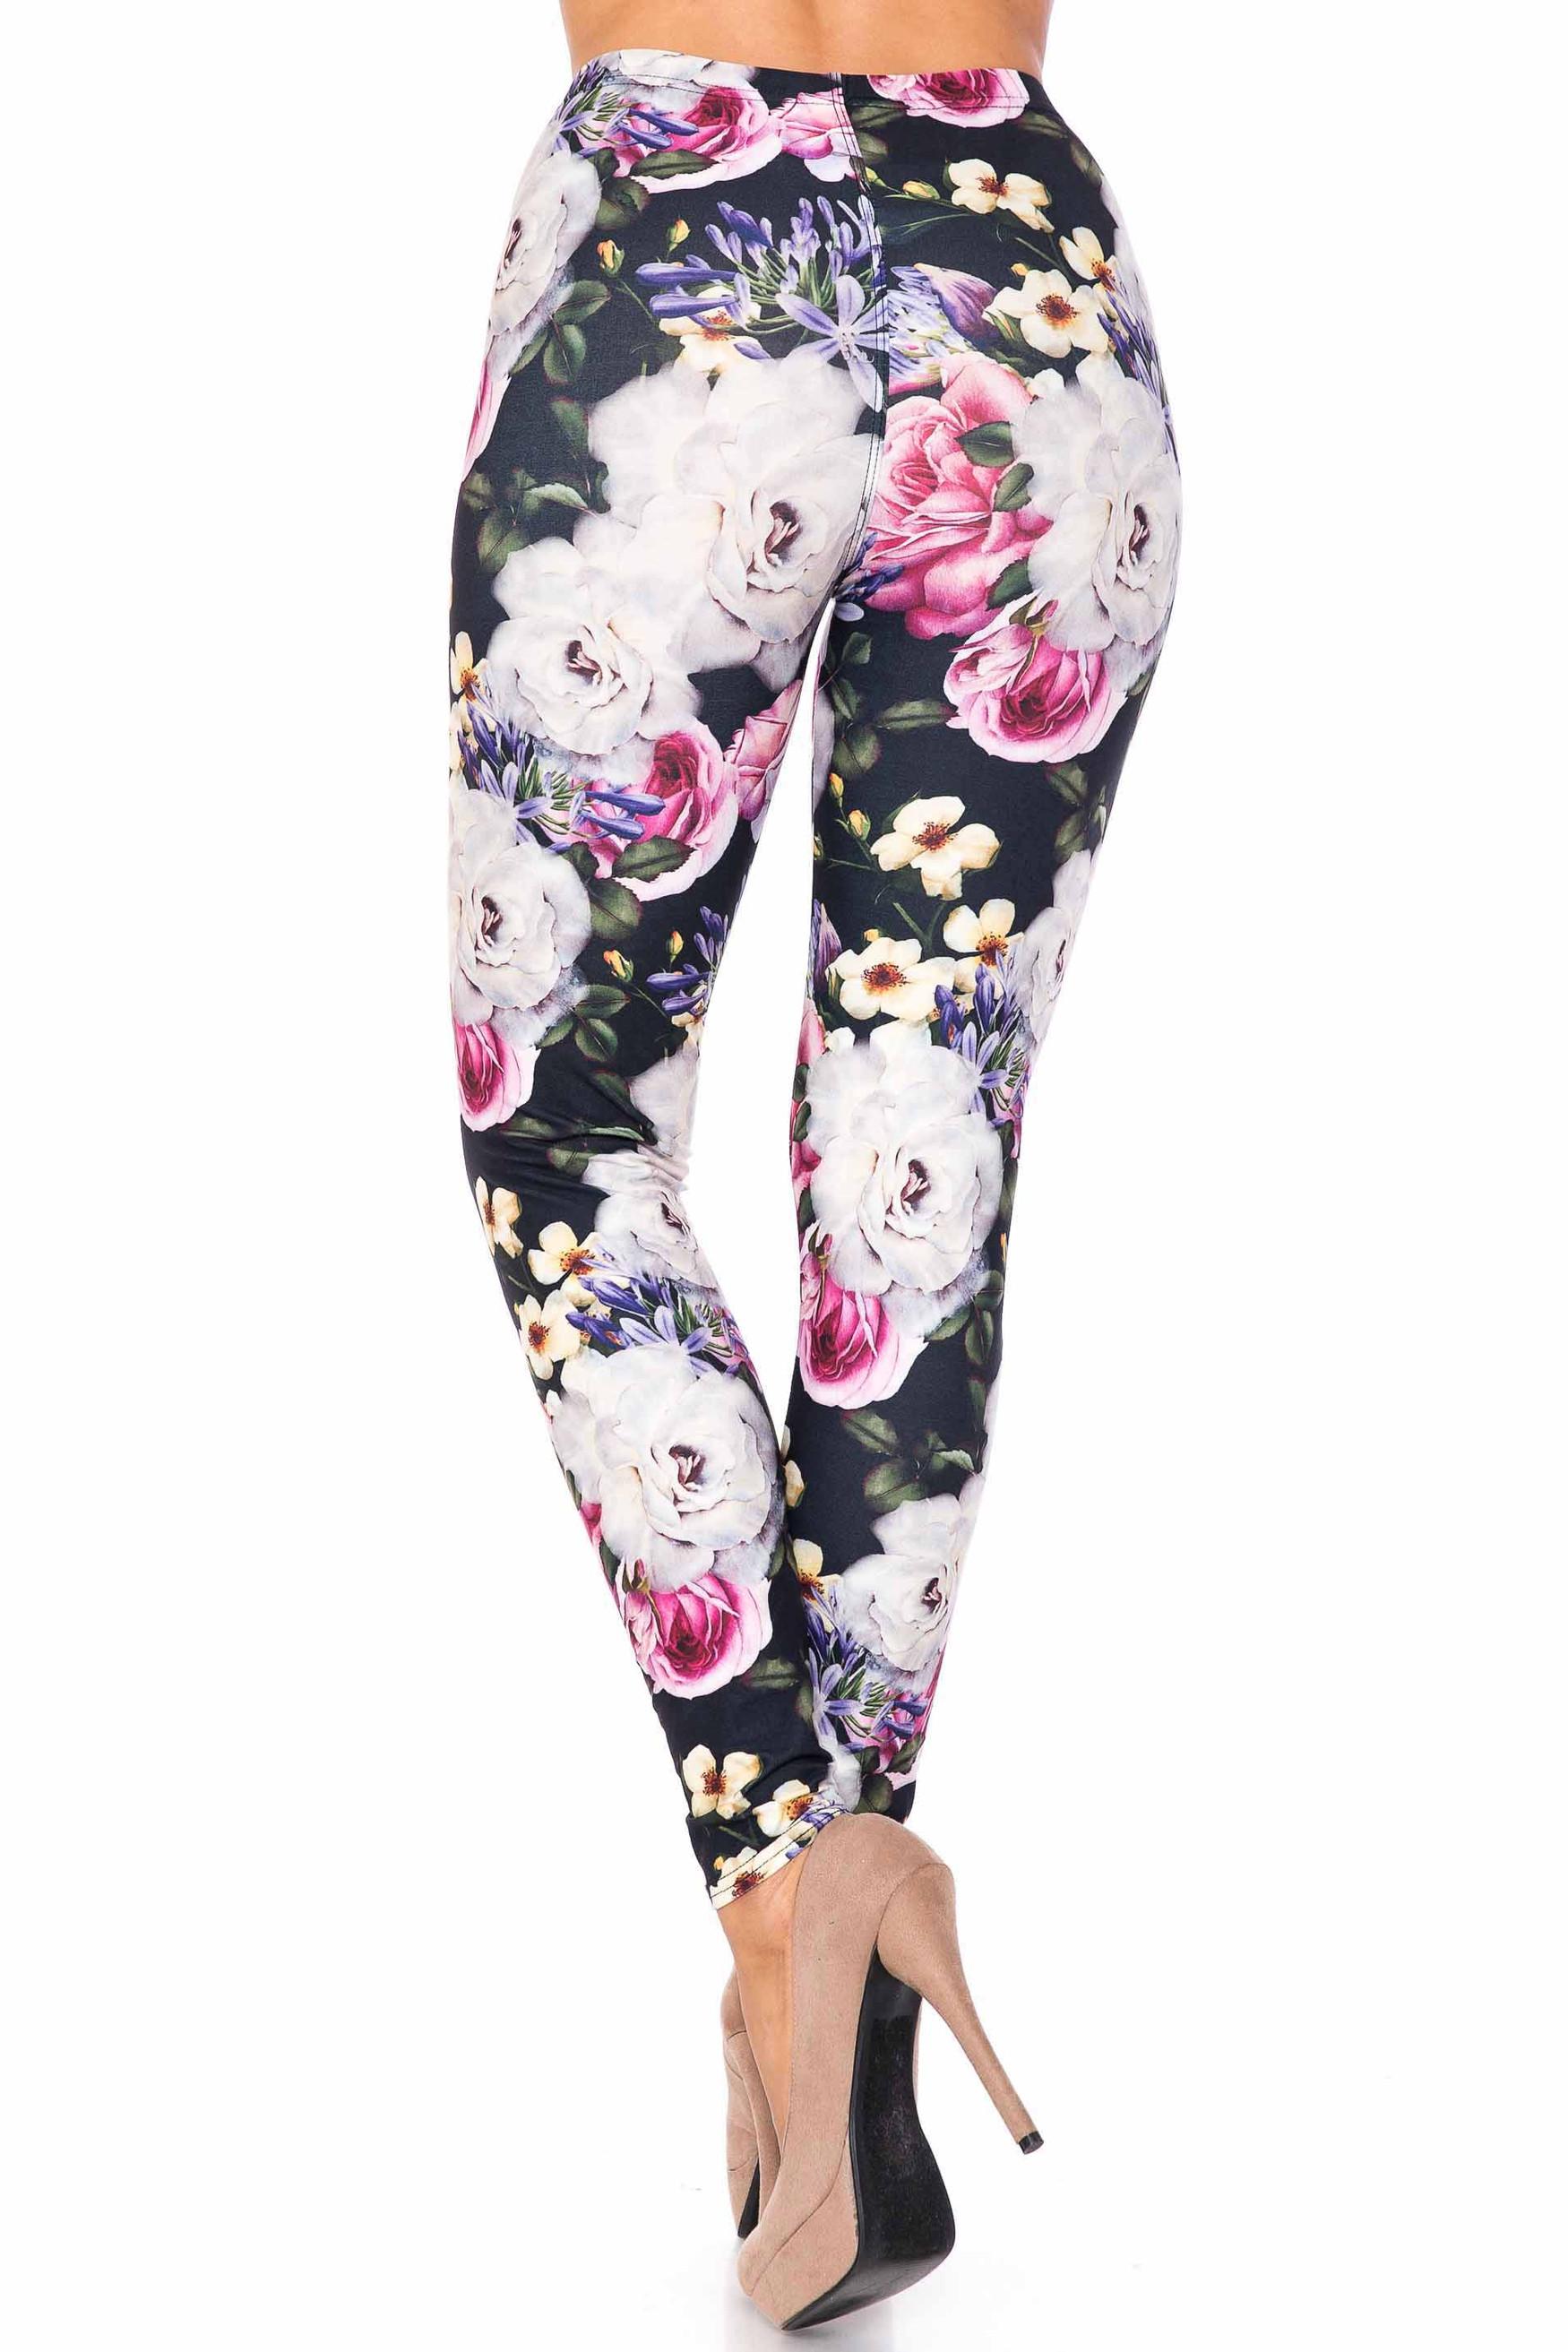 Creamy Soft Floral Garden Bouquet Extra Plus Size Leggings - 3X-5X - USA Fashion™